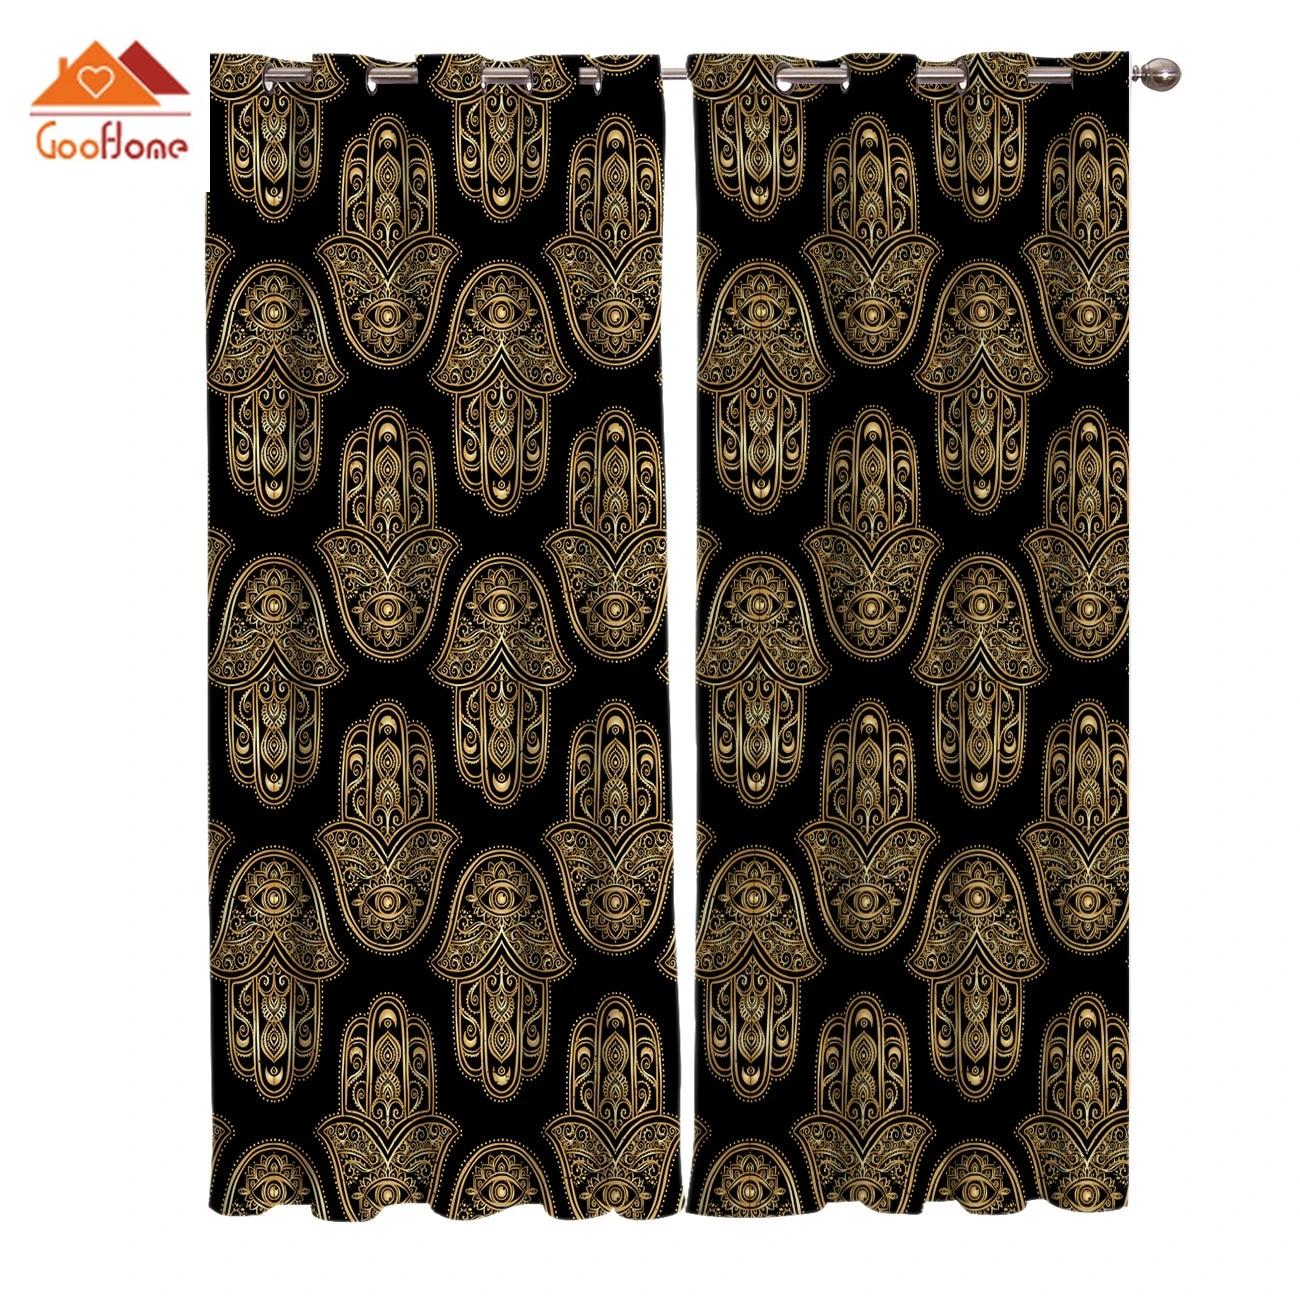 retro black and gold mandala window curtains living room outdoor fabric drapes curtain home decor